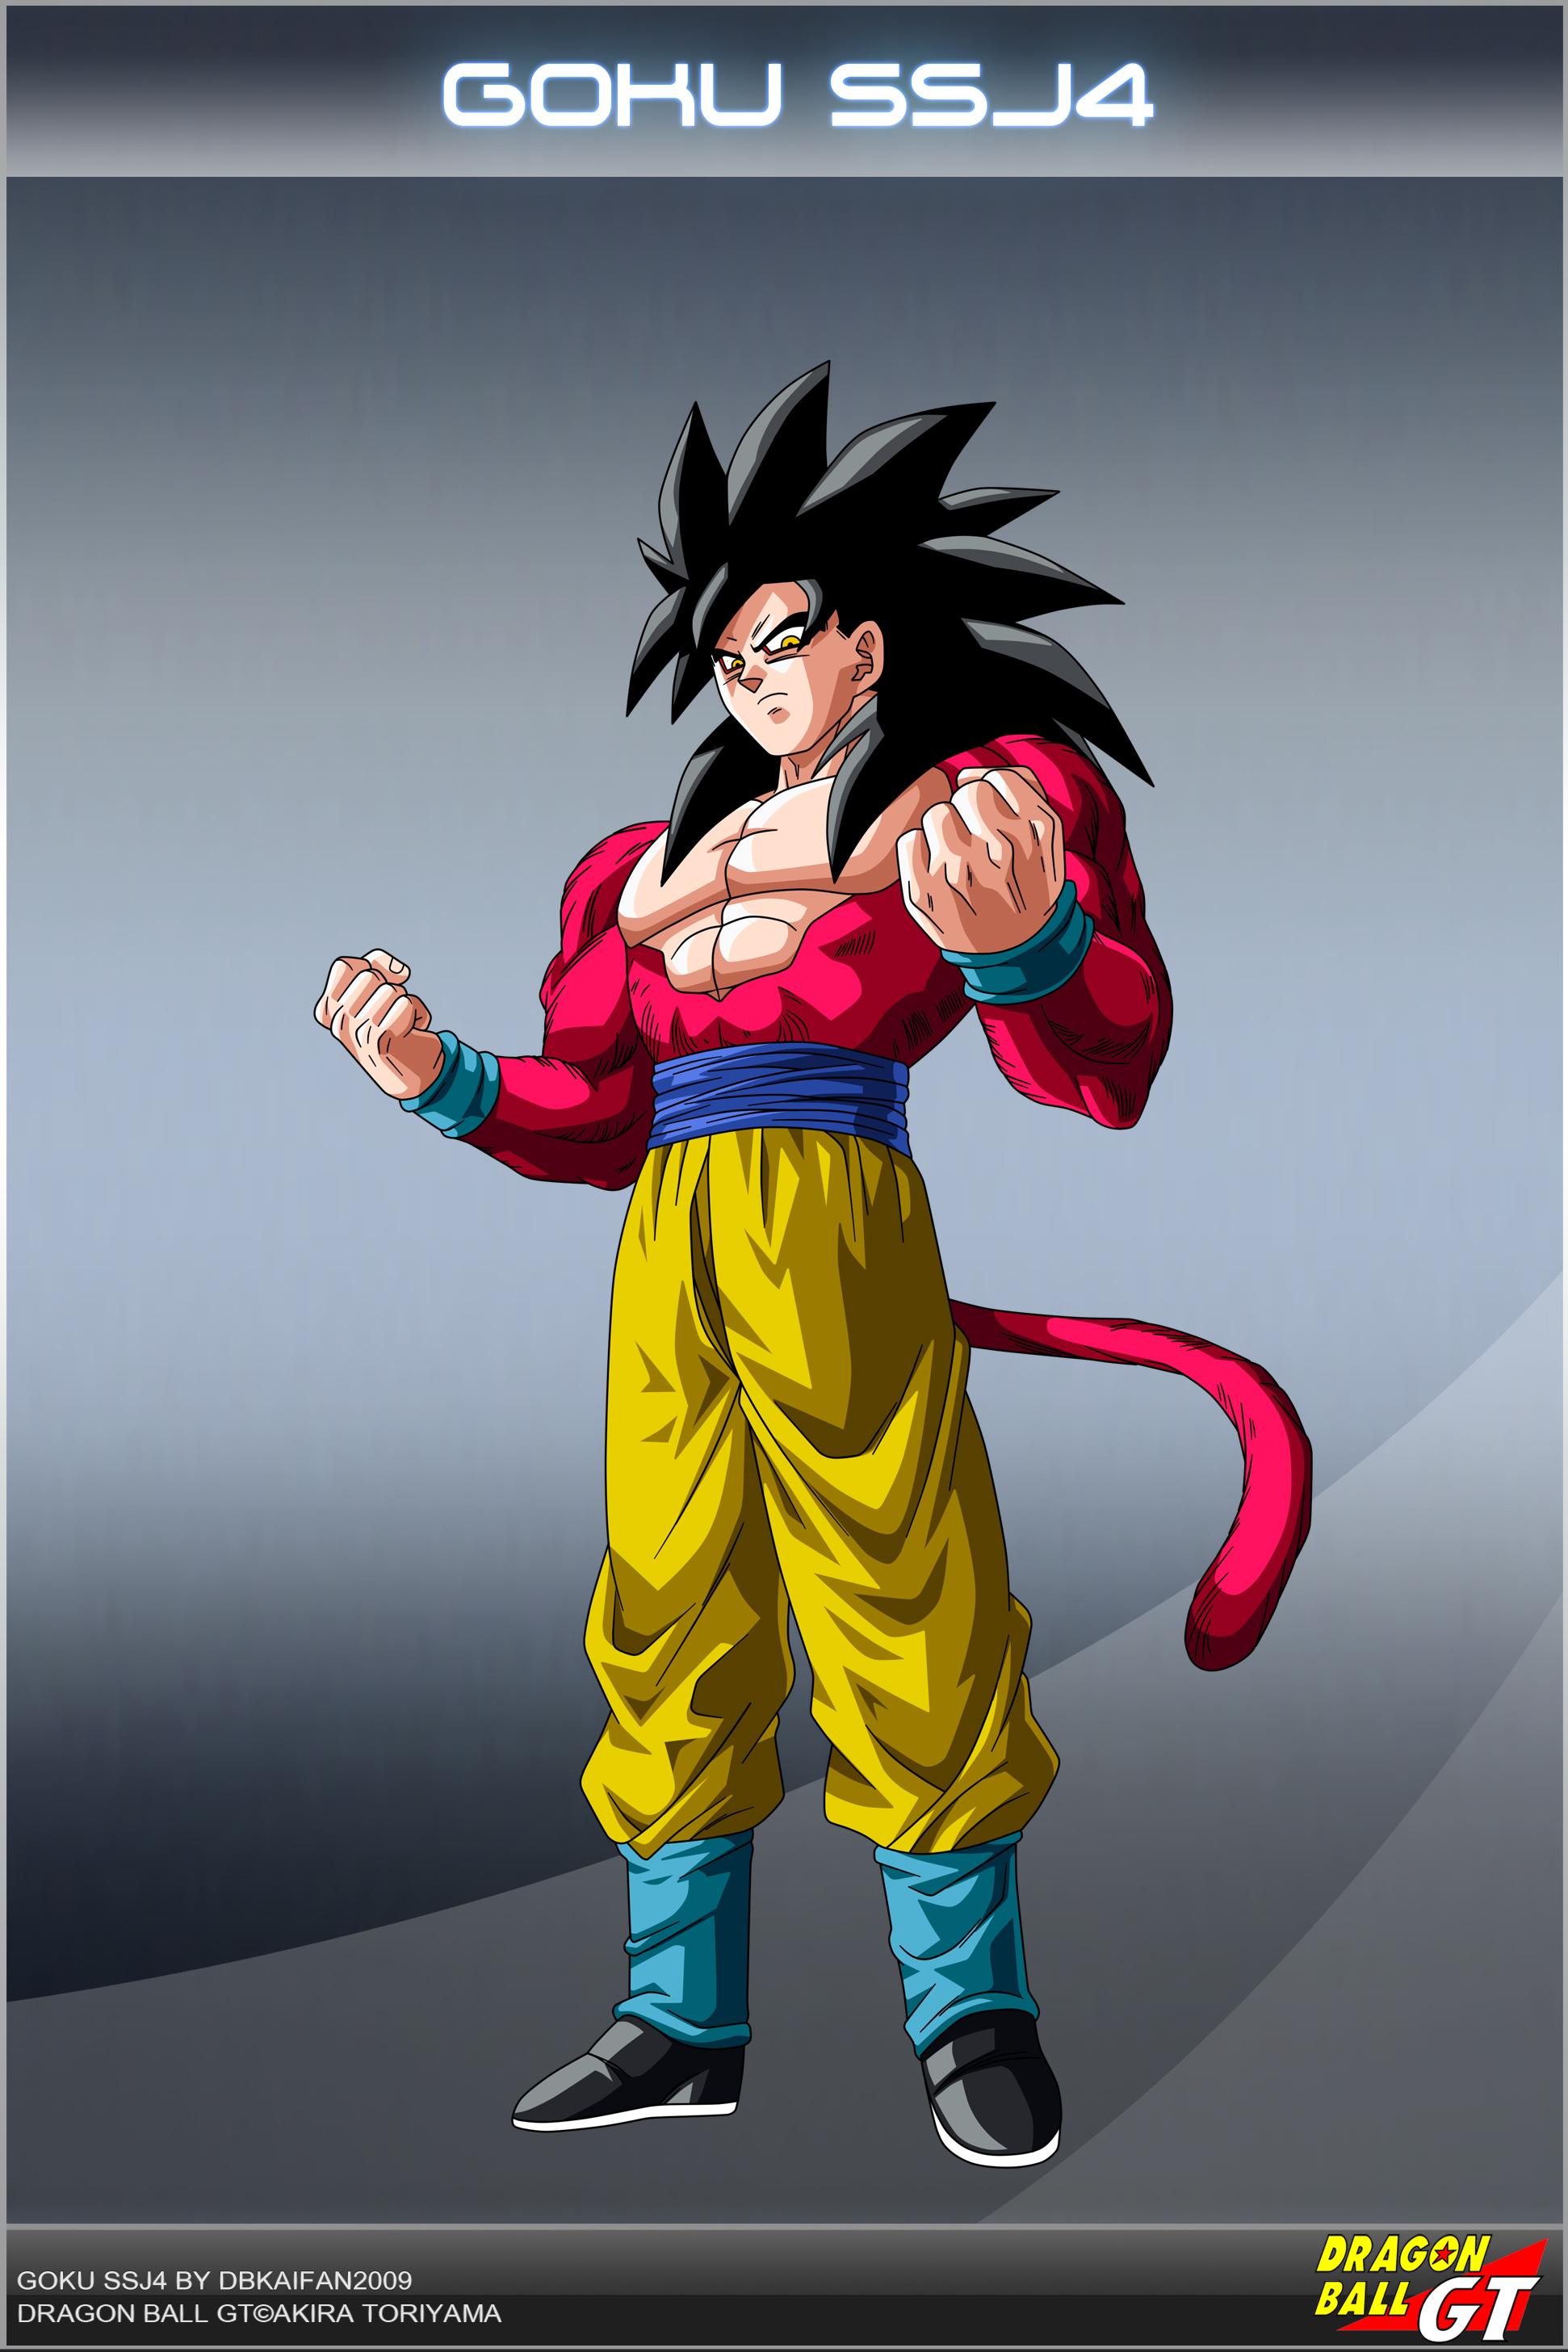 Dragon Ball z Wallpapers Vegeta Ssj4 Dragon Ball gt Goku Ssj4 os